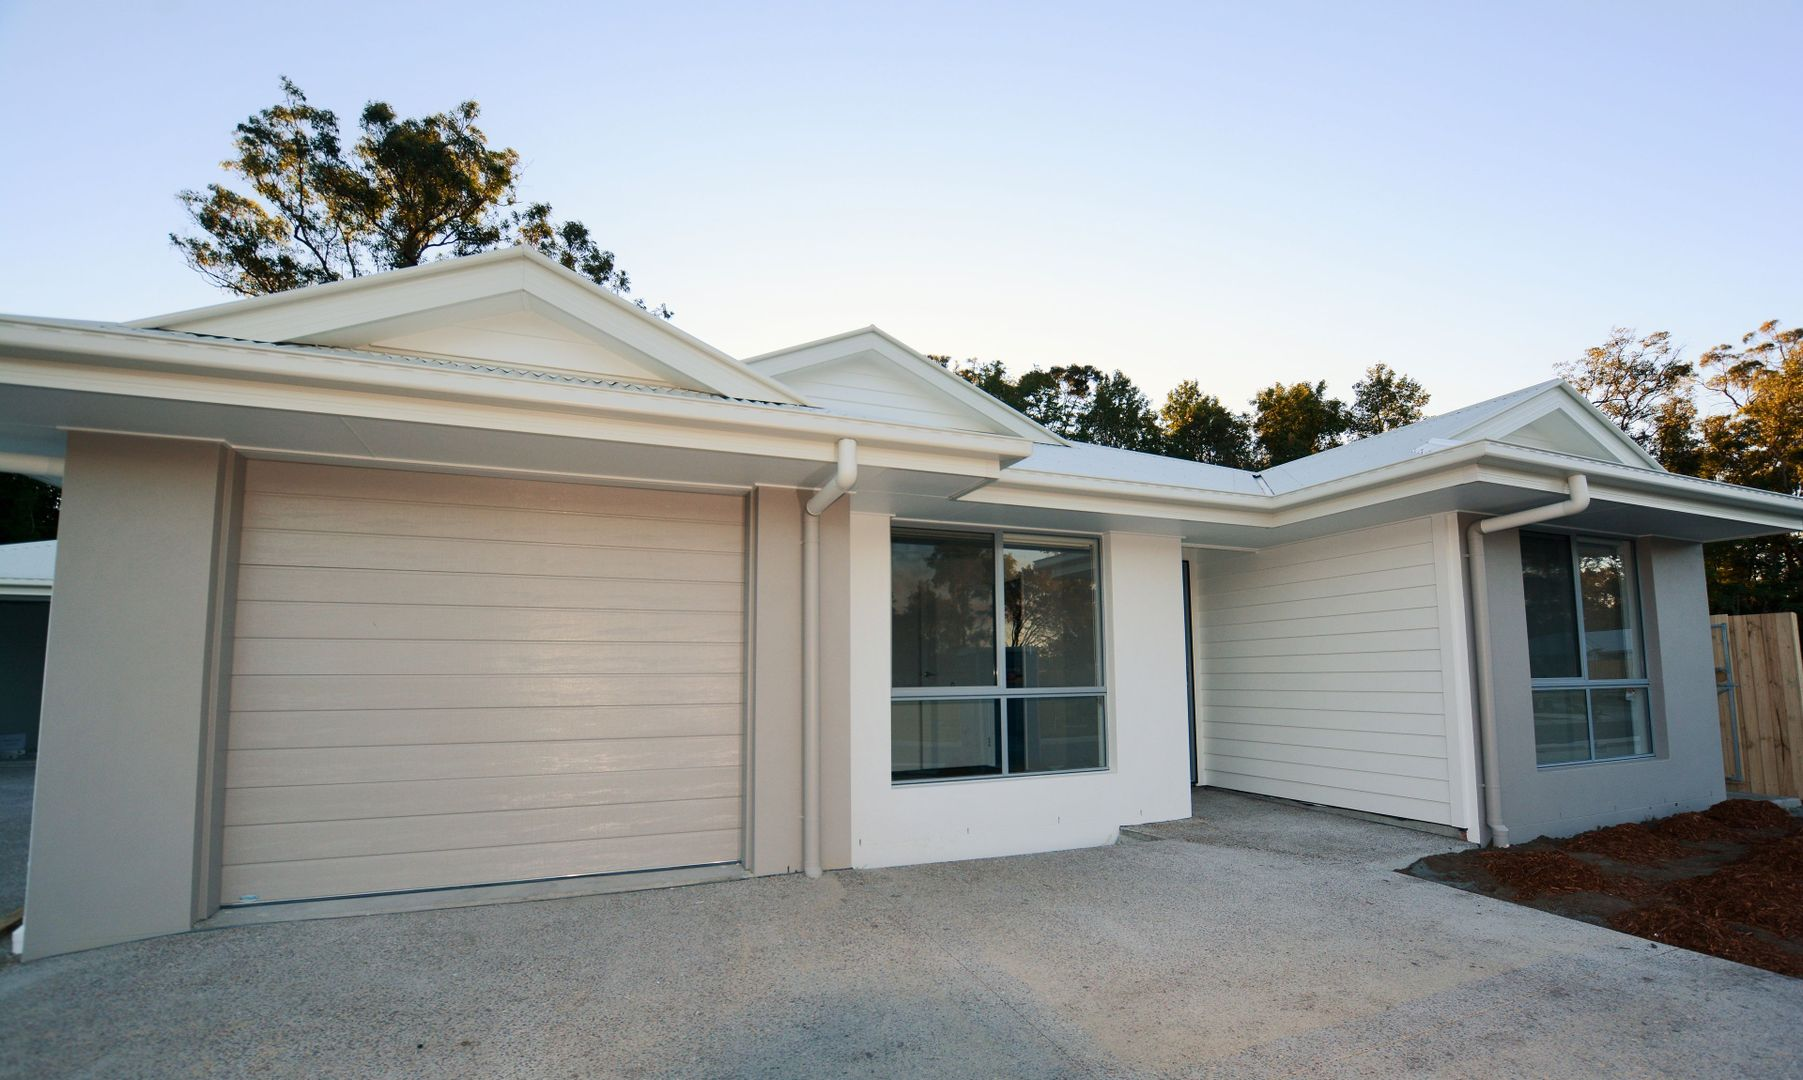 2/7 Woodbrook Drive, Buderim QLD 4556, Image 0